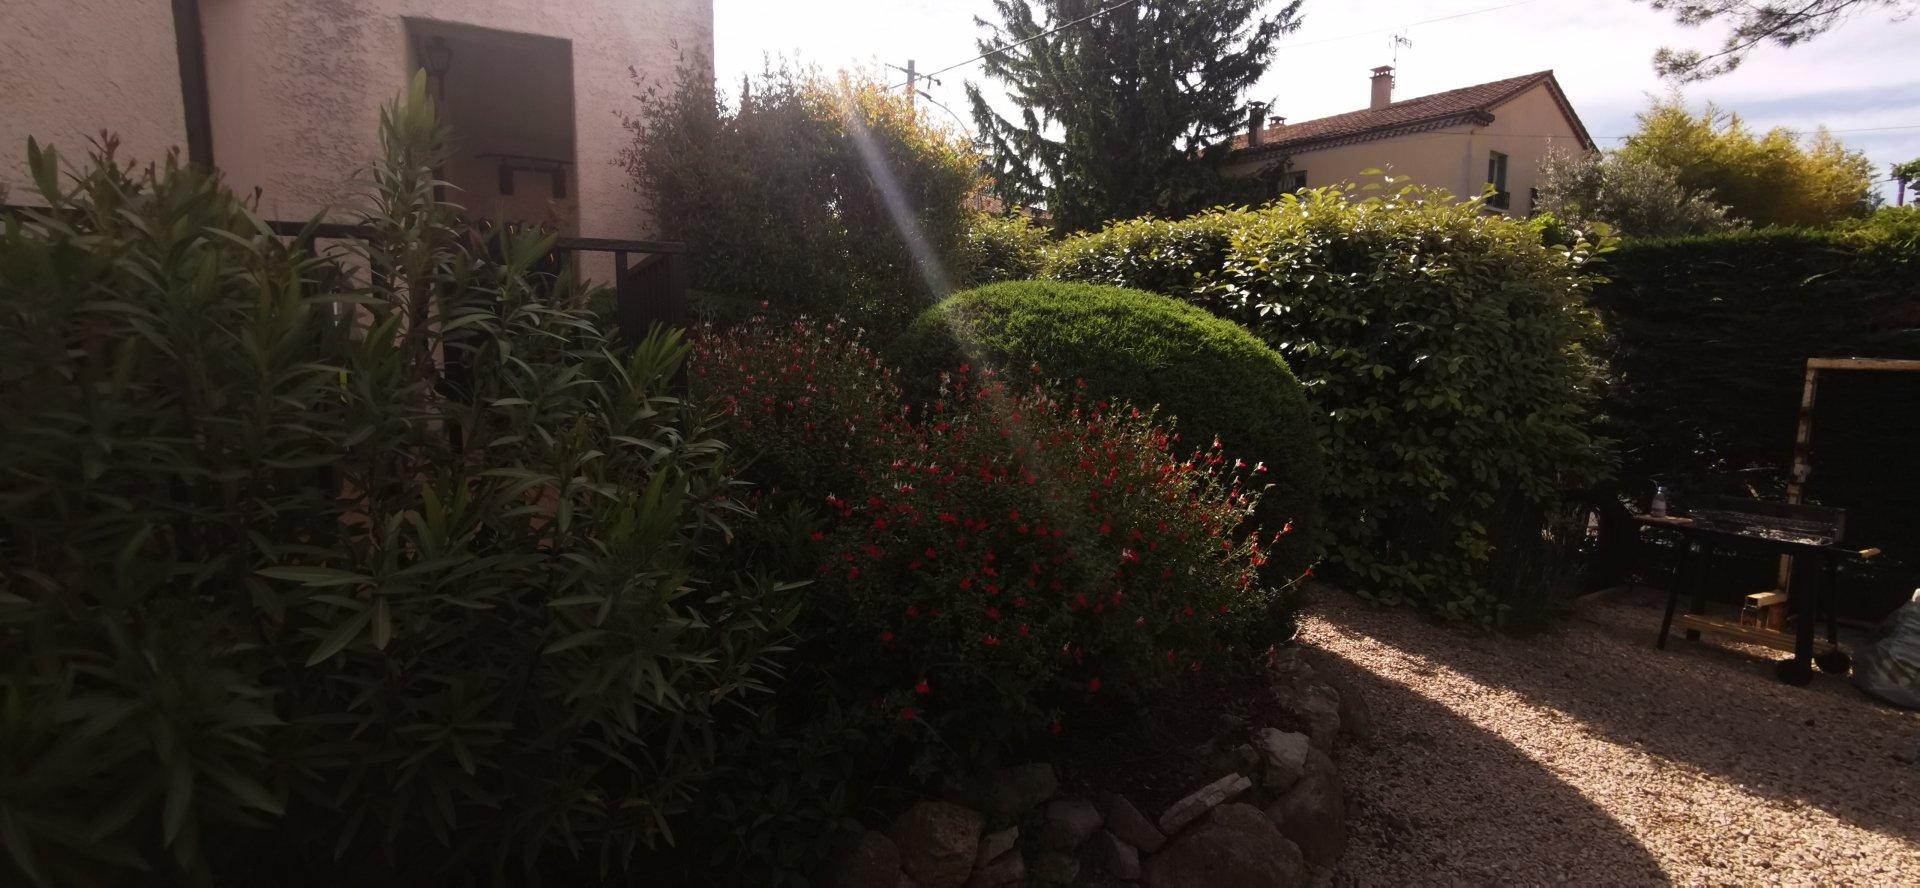 proche CV, 2 chambres, jardin, parking